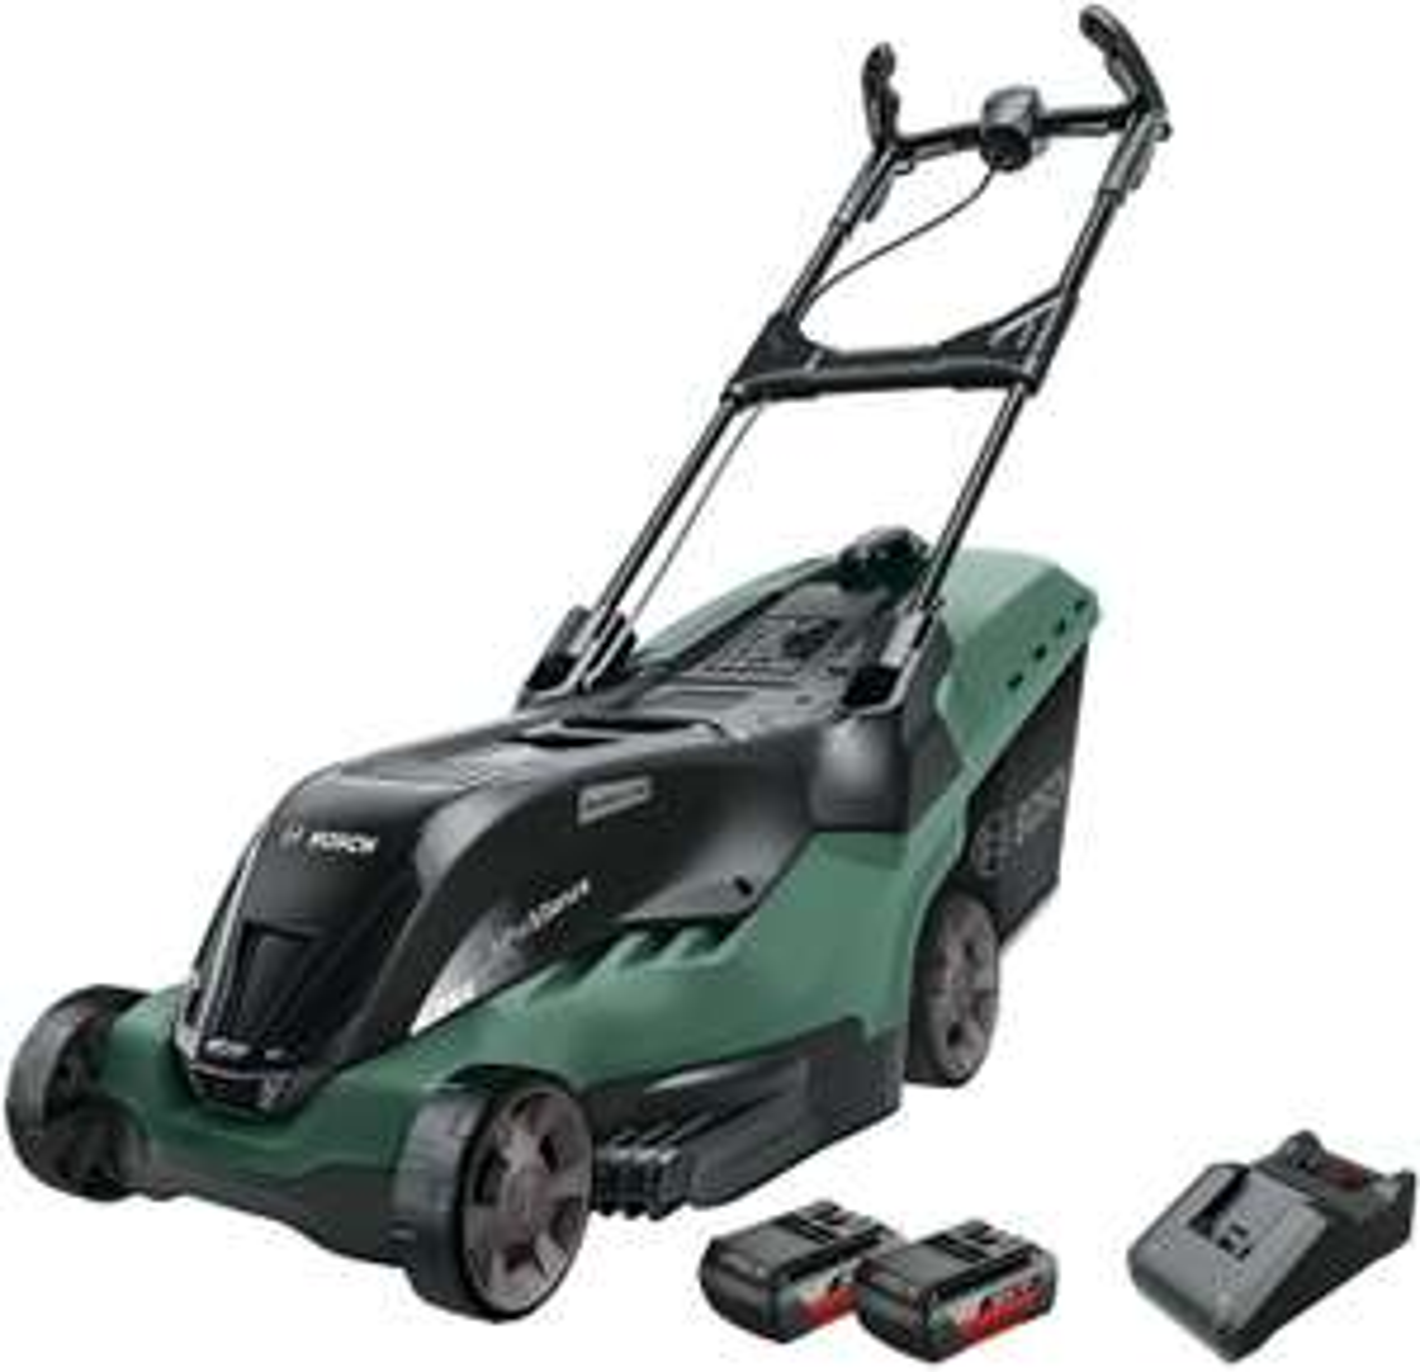 Bosch Cordless Lawnmower AdvancedRotak 36-660 + 2x Battery 2.0 Ah - £345.17 @ Amazon Prime Exclusive